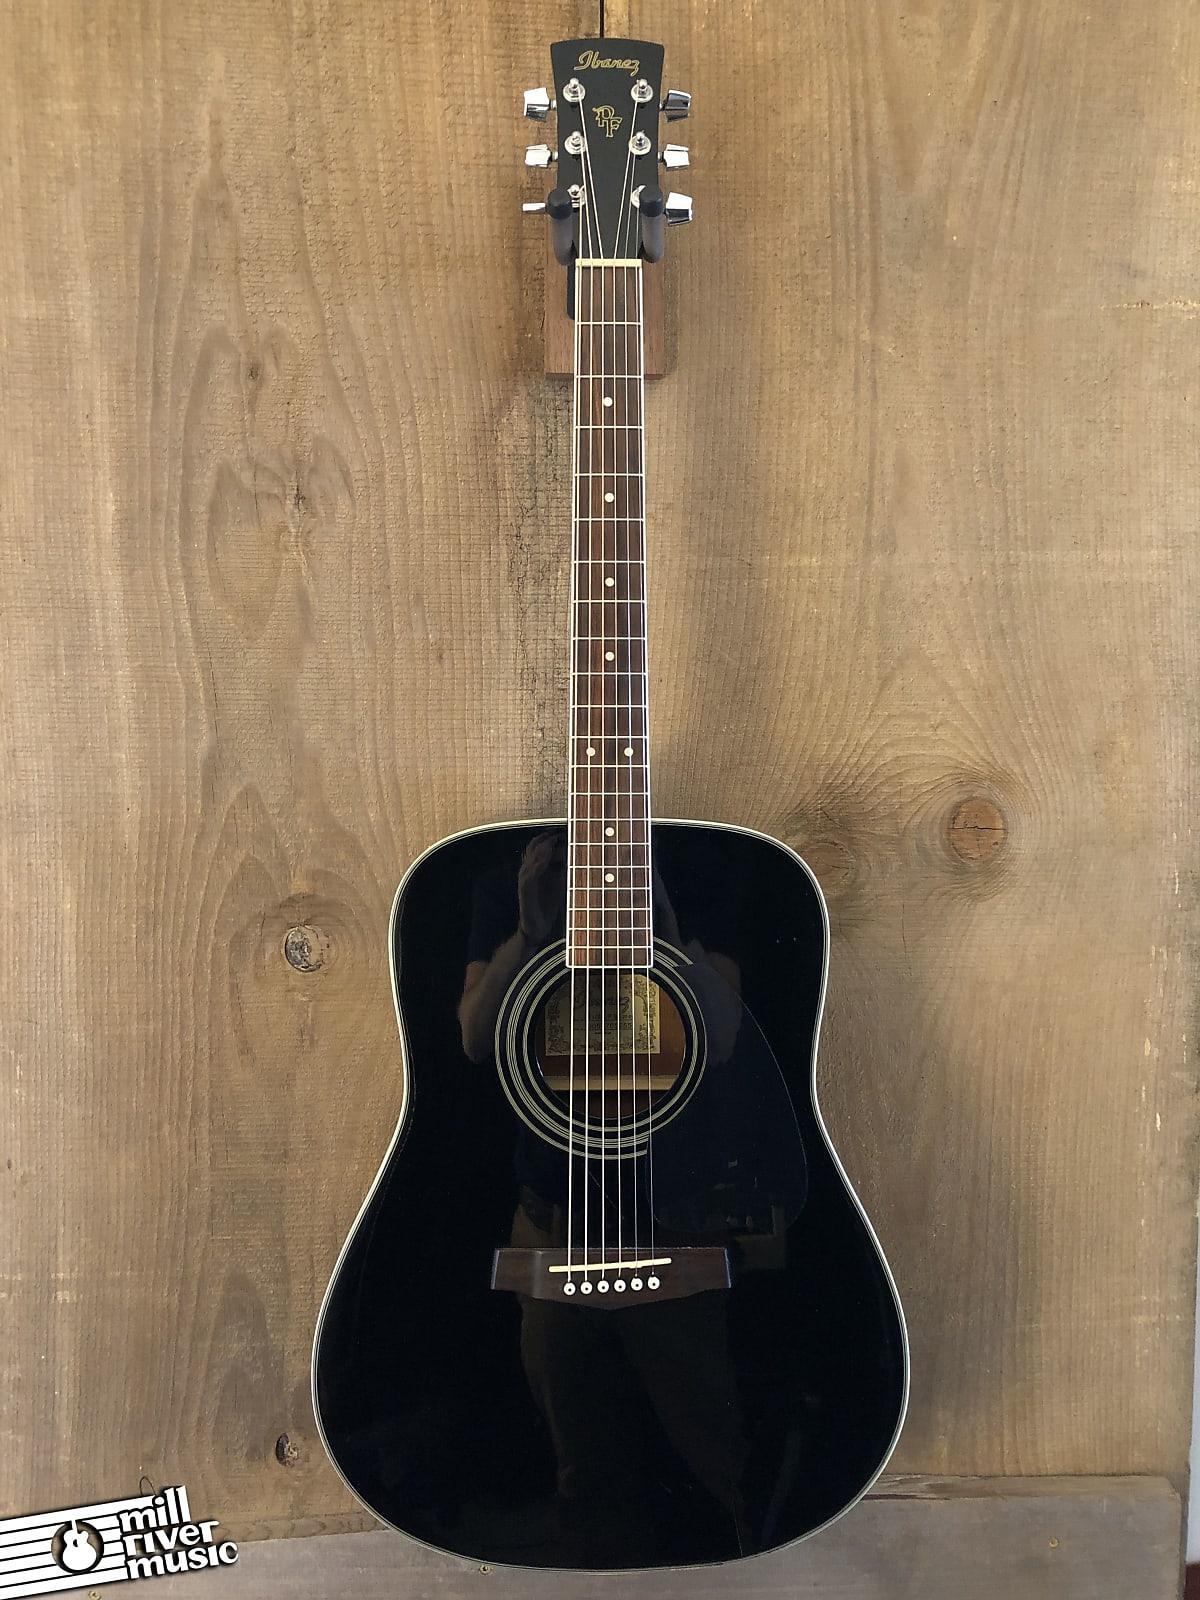 Ibanez PF104SJP-BK Dreadnought Acoustic Guitar Black 2005